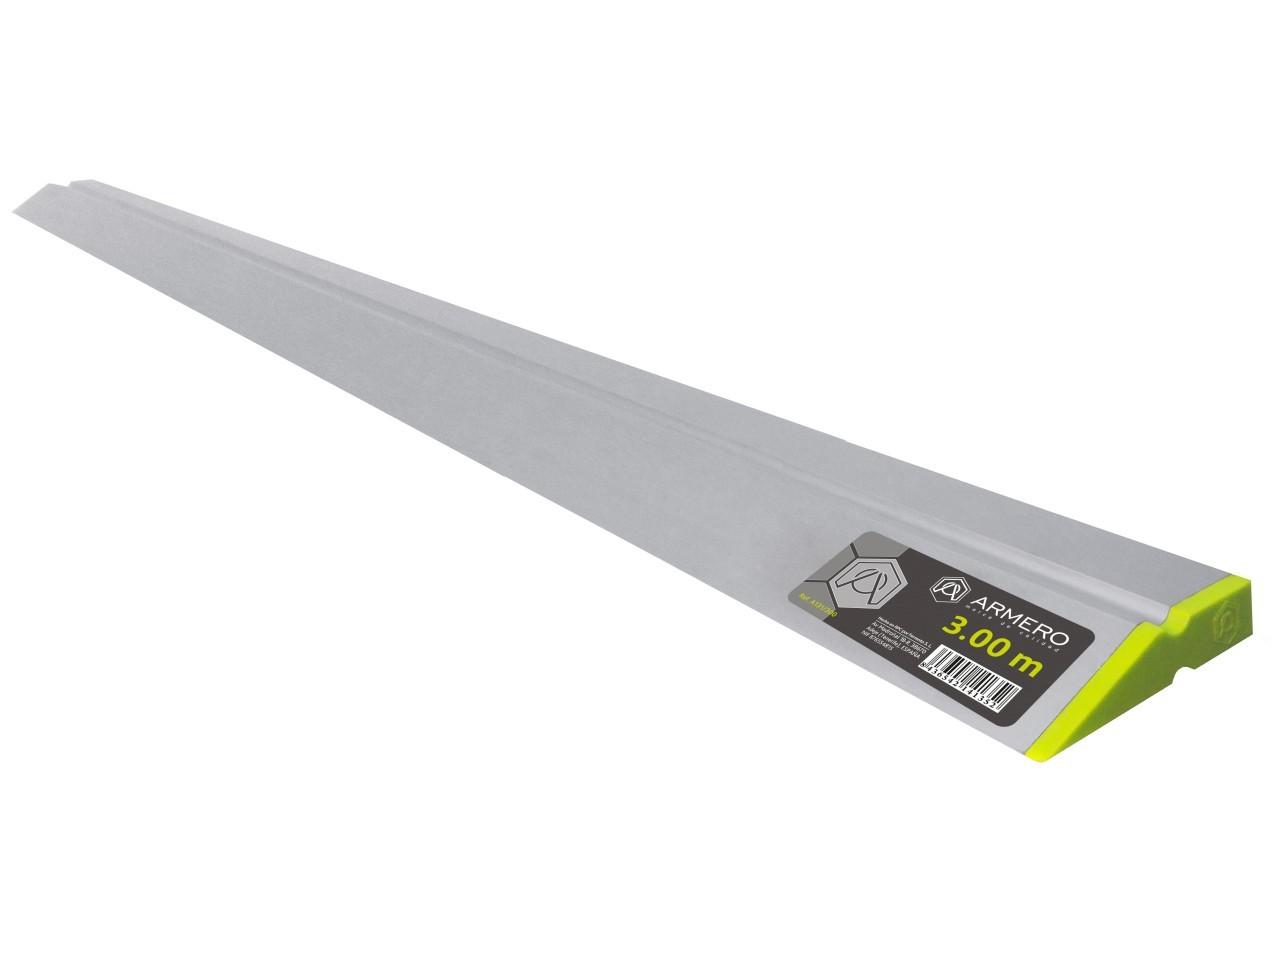 Правило алюминиевое A131/300, 3.0м